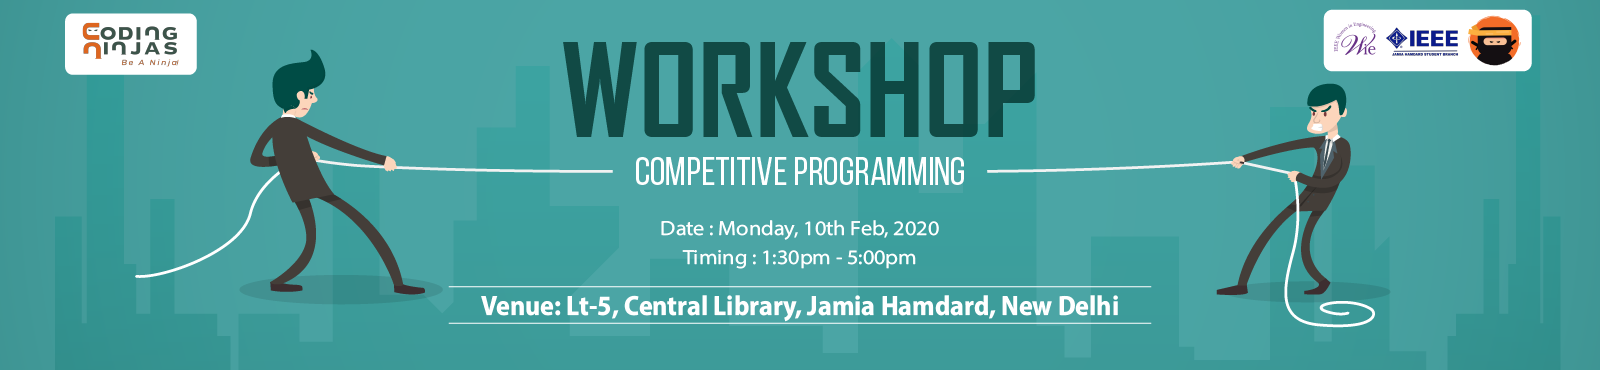 Coding Ninjas at Jamia Hamdard'20